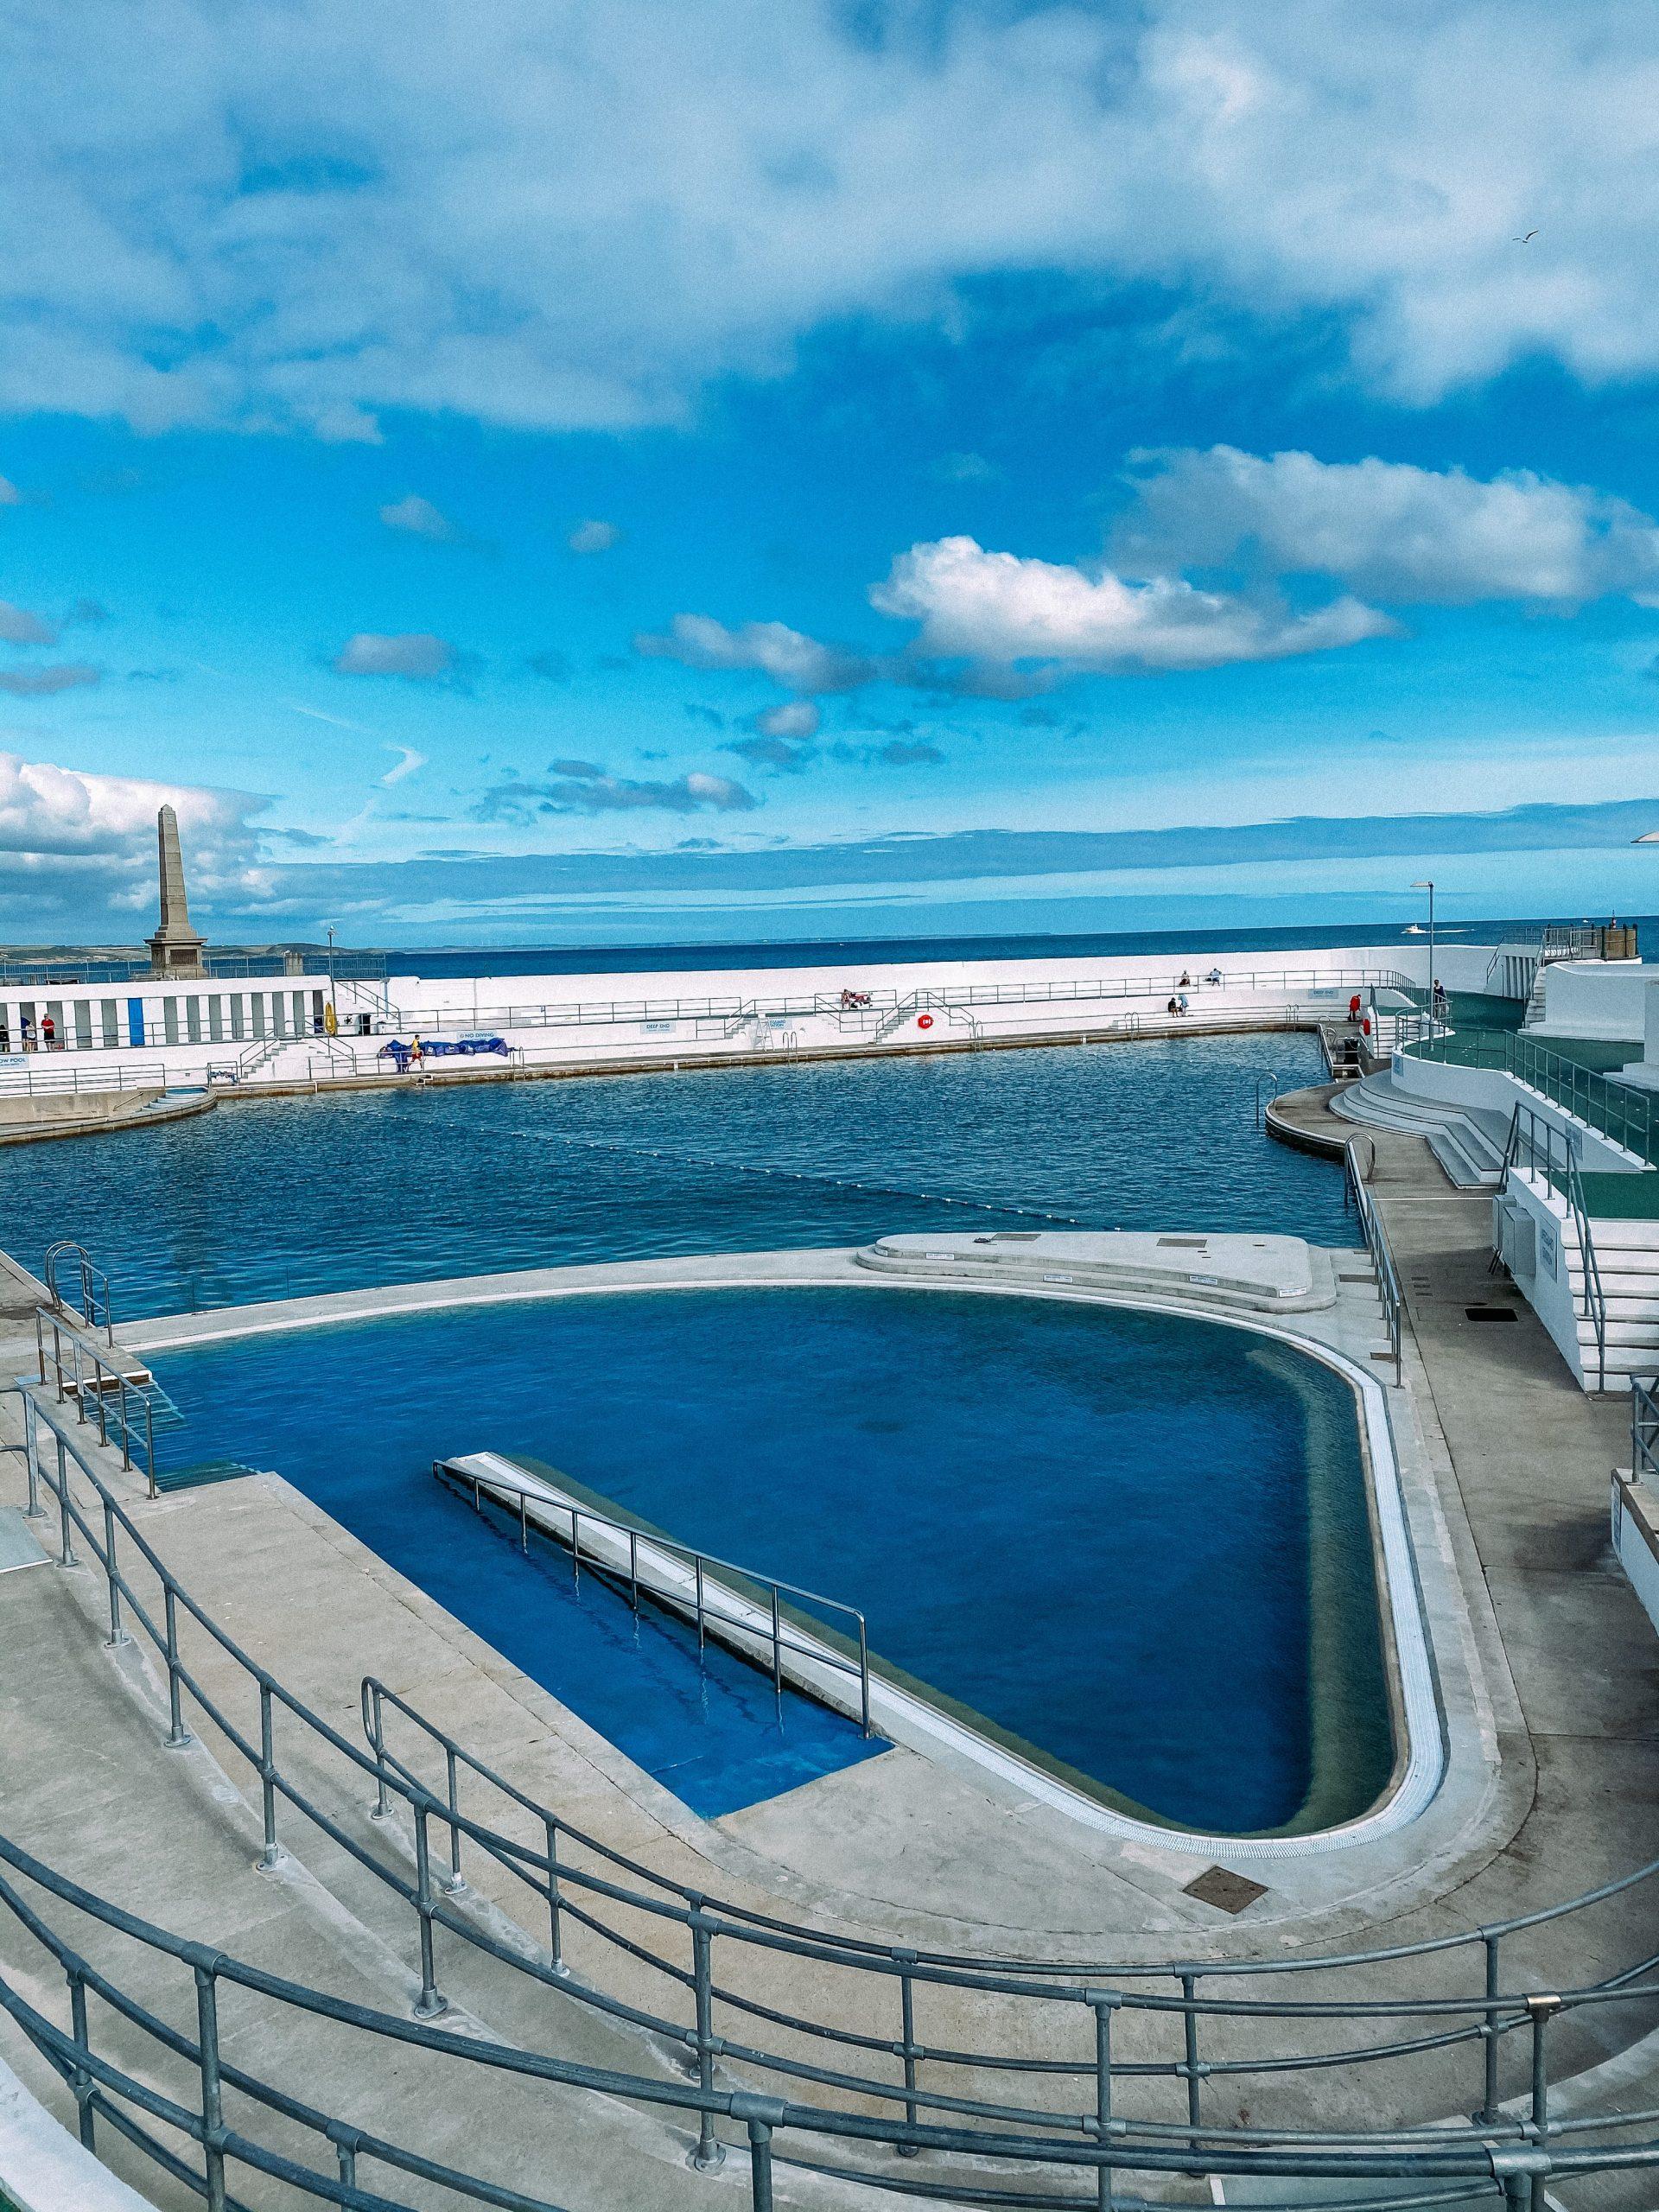 Jubilee Pool, Penzance, Cornwall